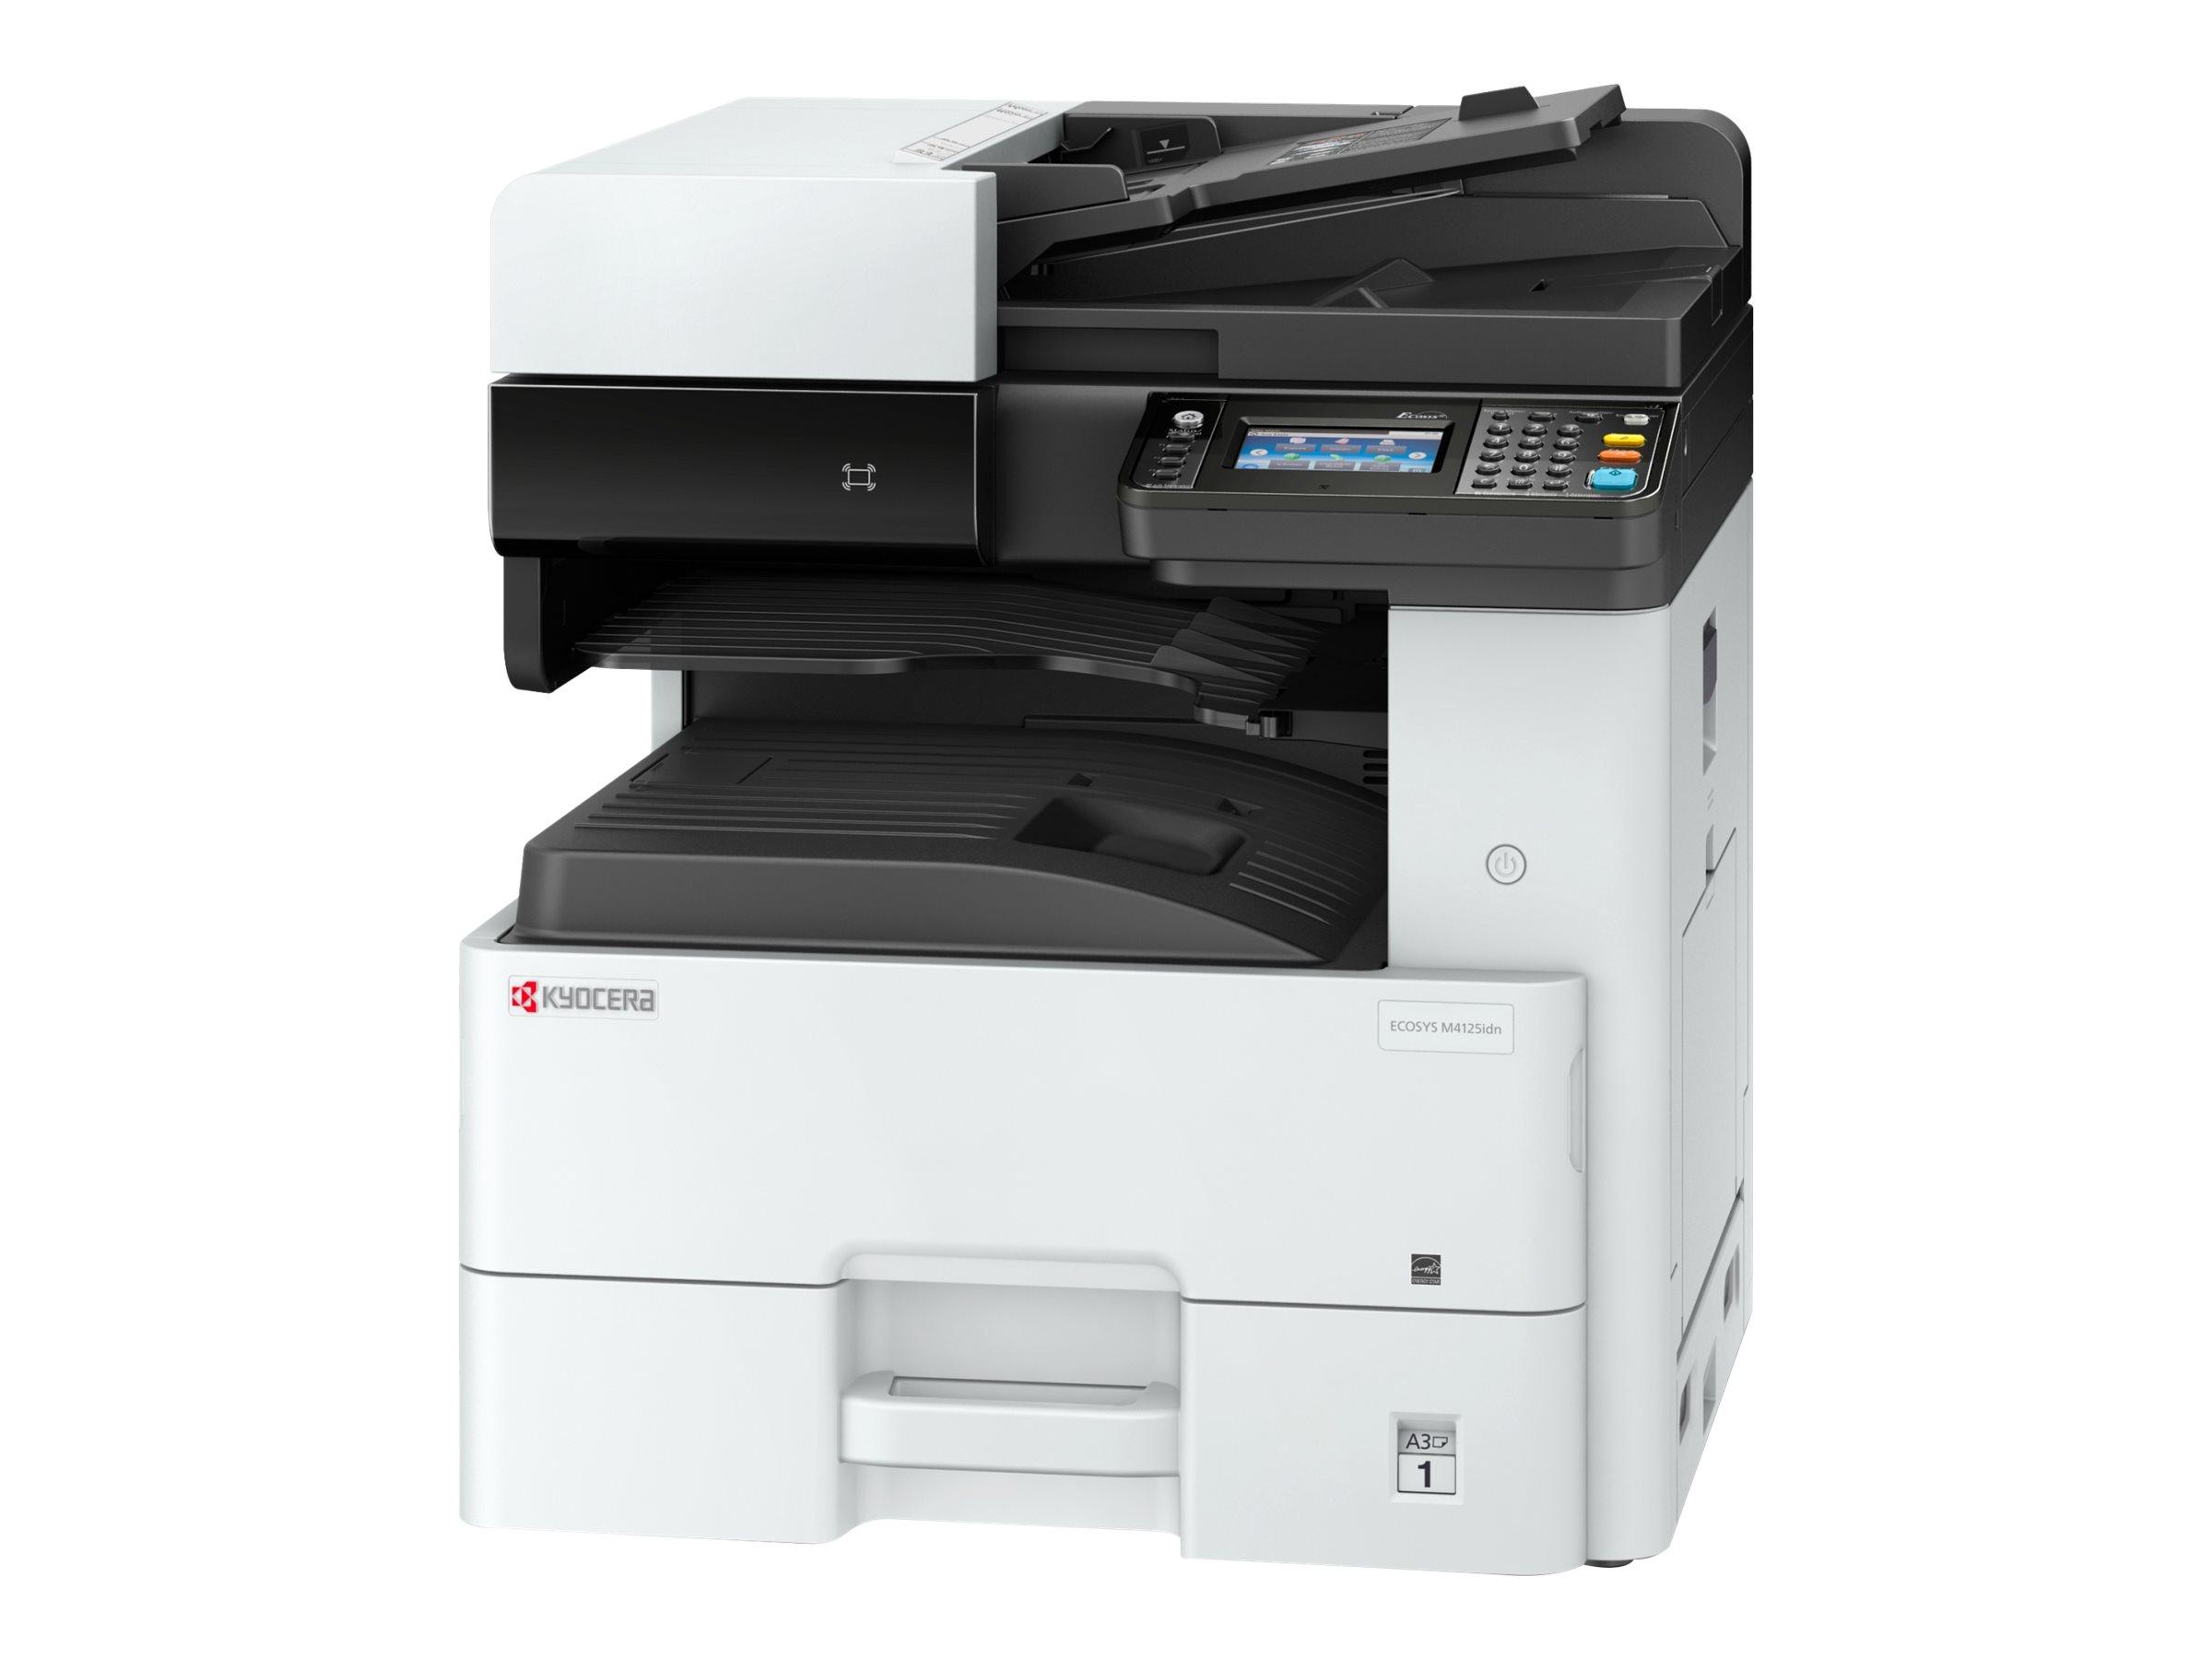 Kyocera ECOSYS M4125idn - Multifunktionsdrucker